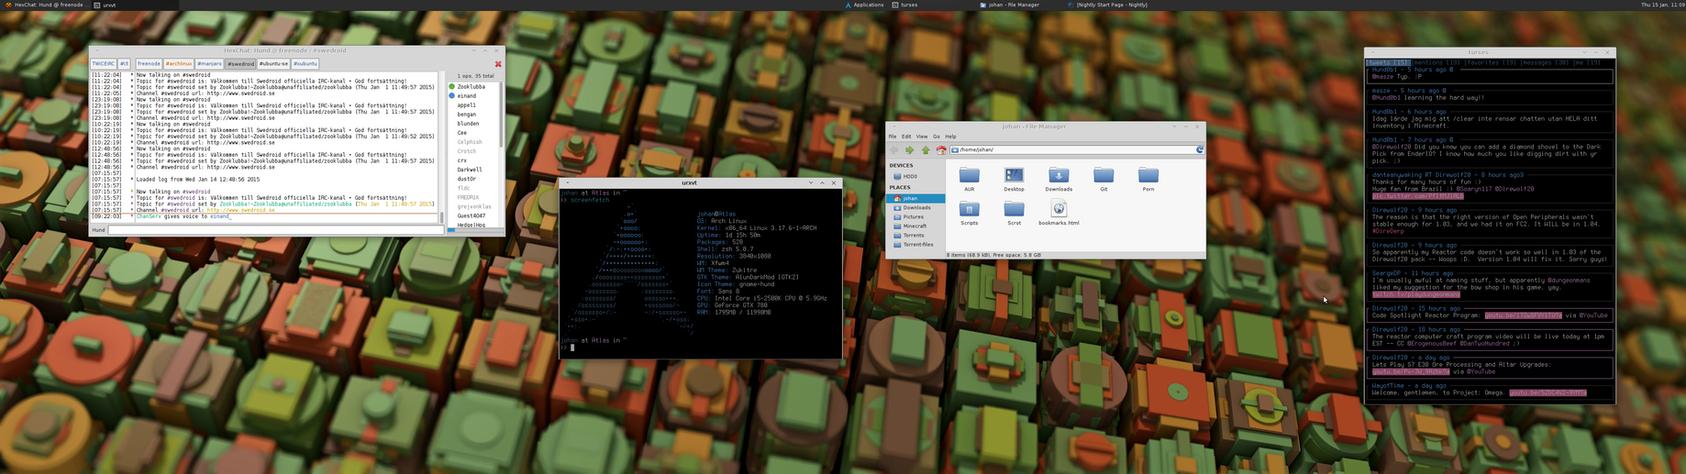 My Desktop - Arch Linux w/ Xfce | January 2015 by hundone